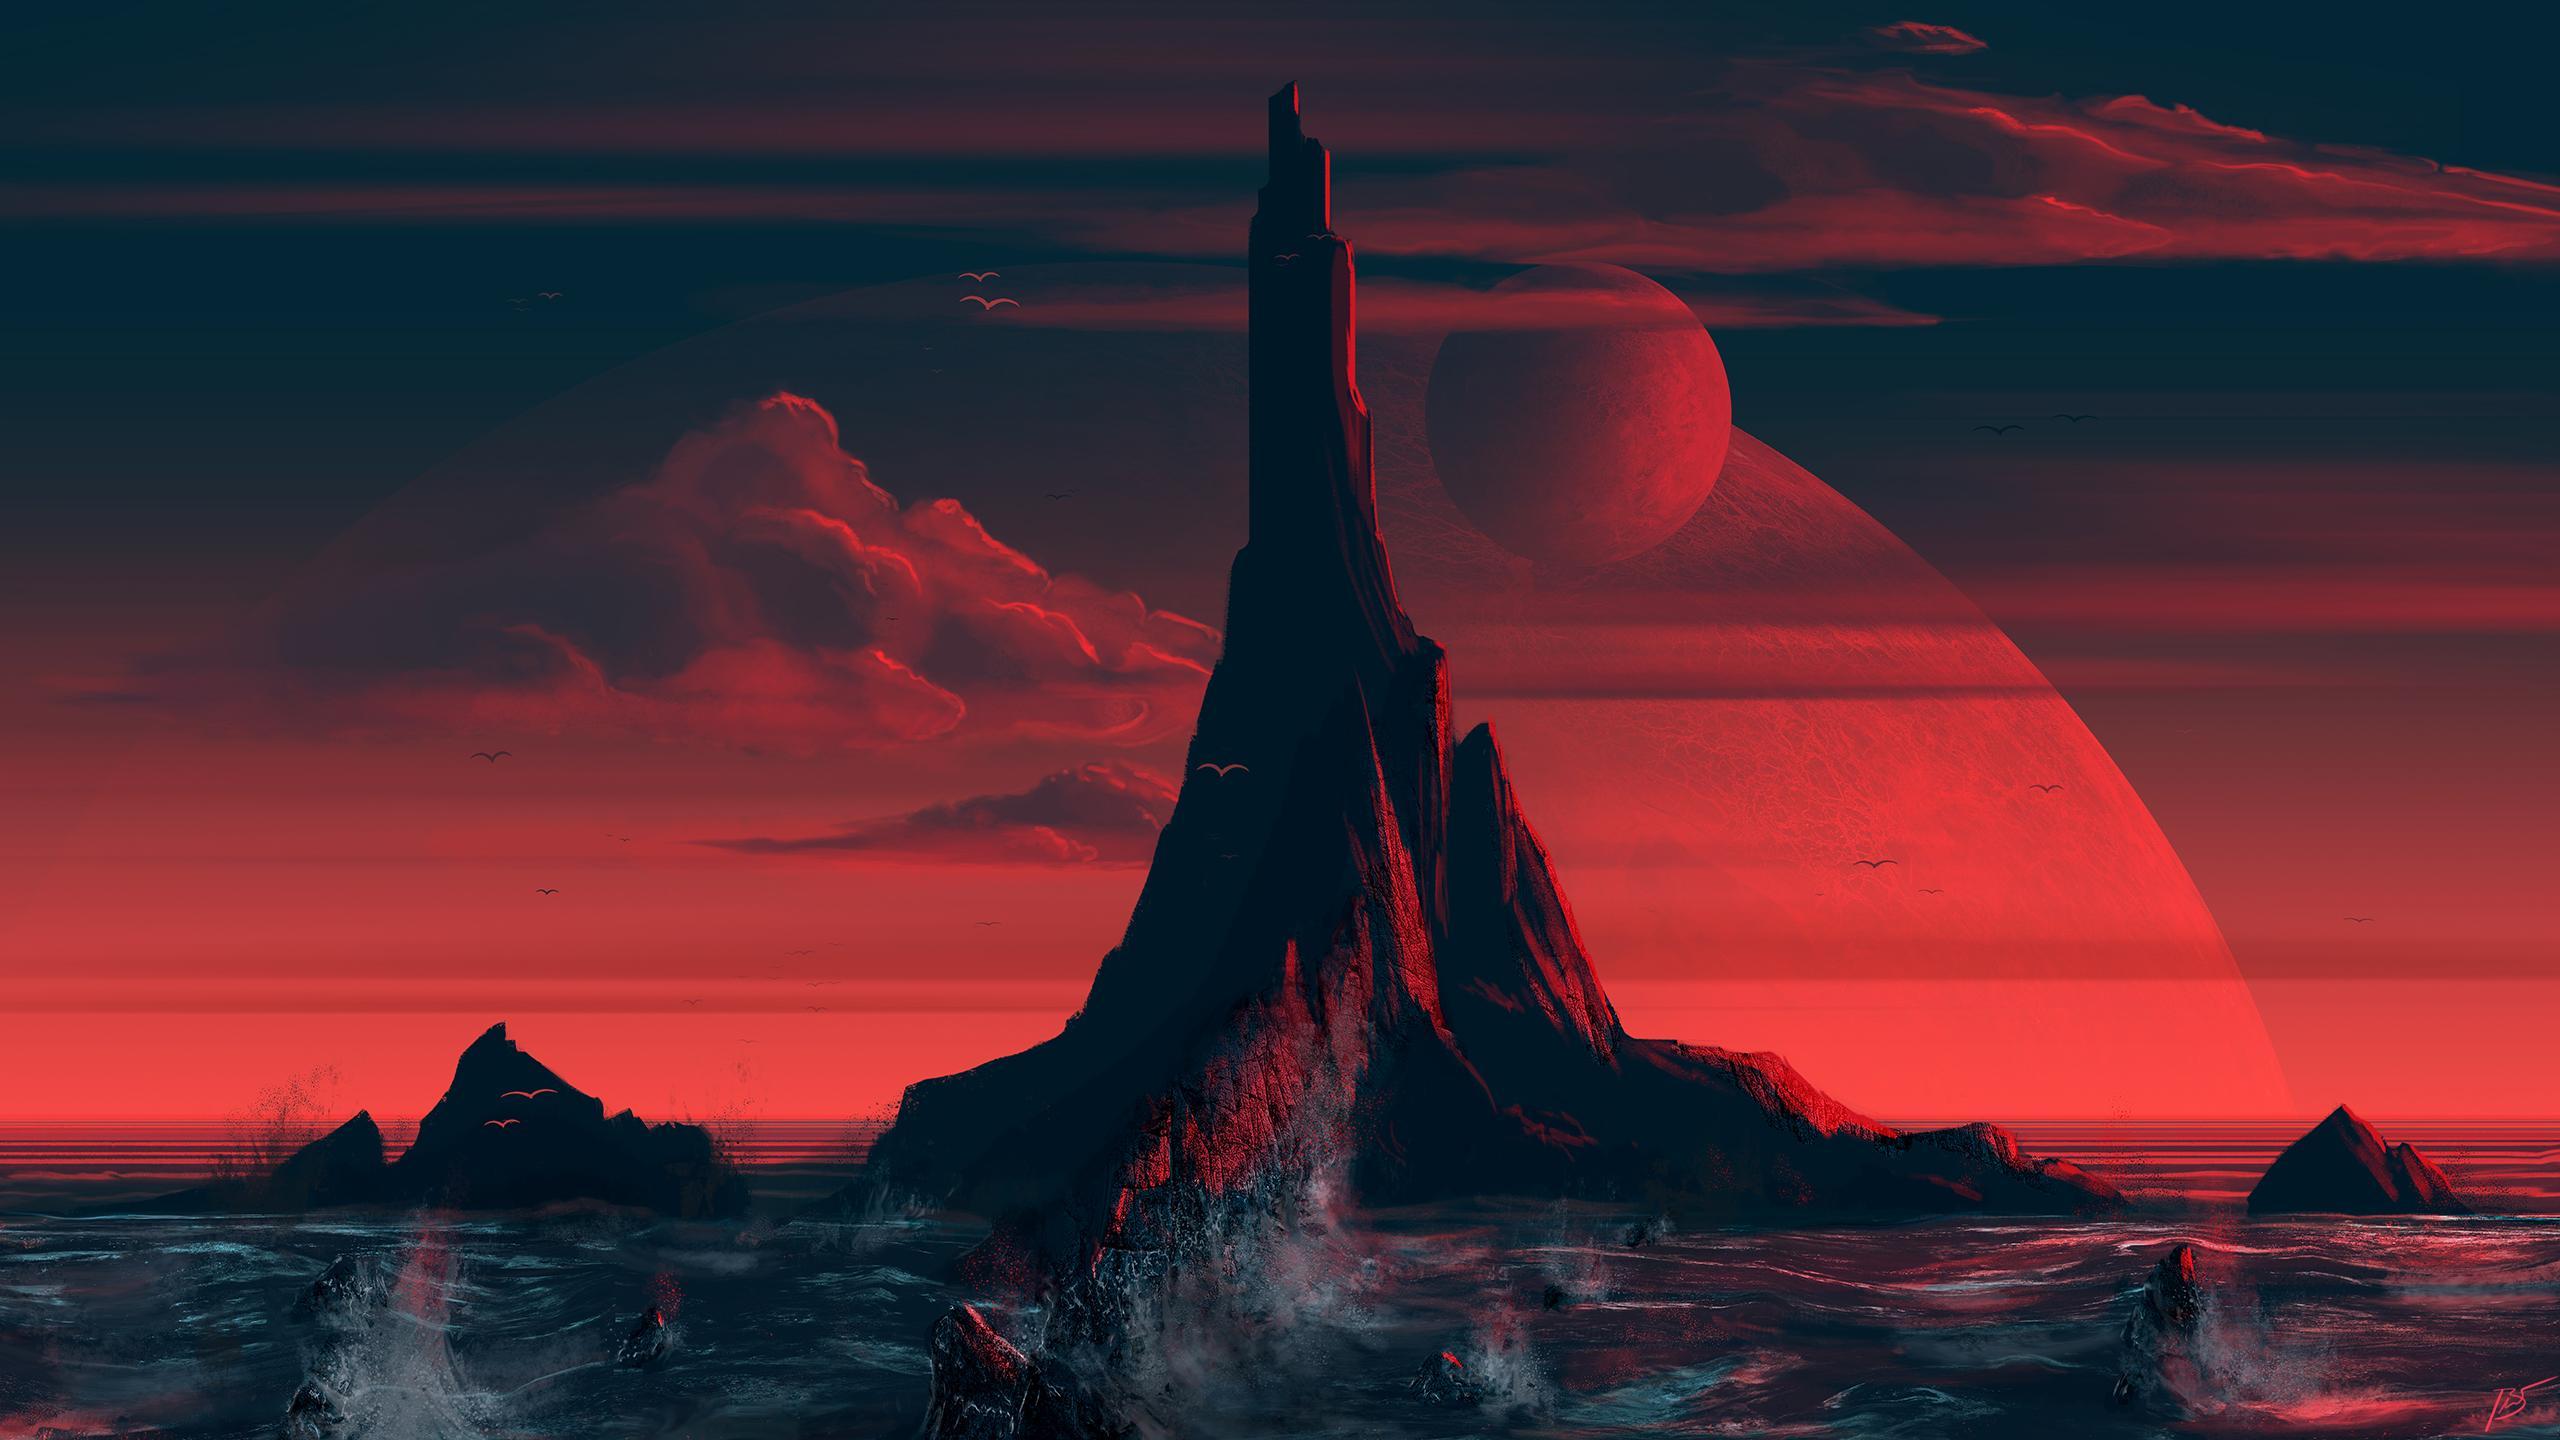 Red Island HD Wallpaper